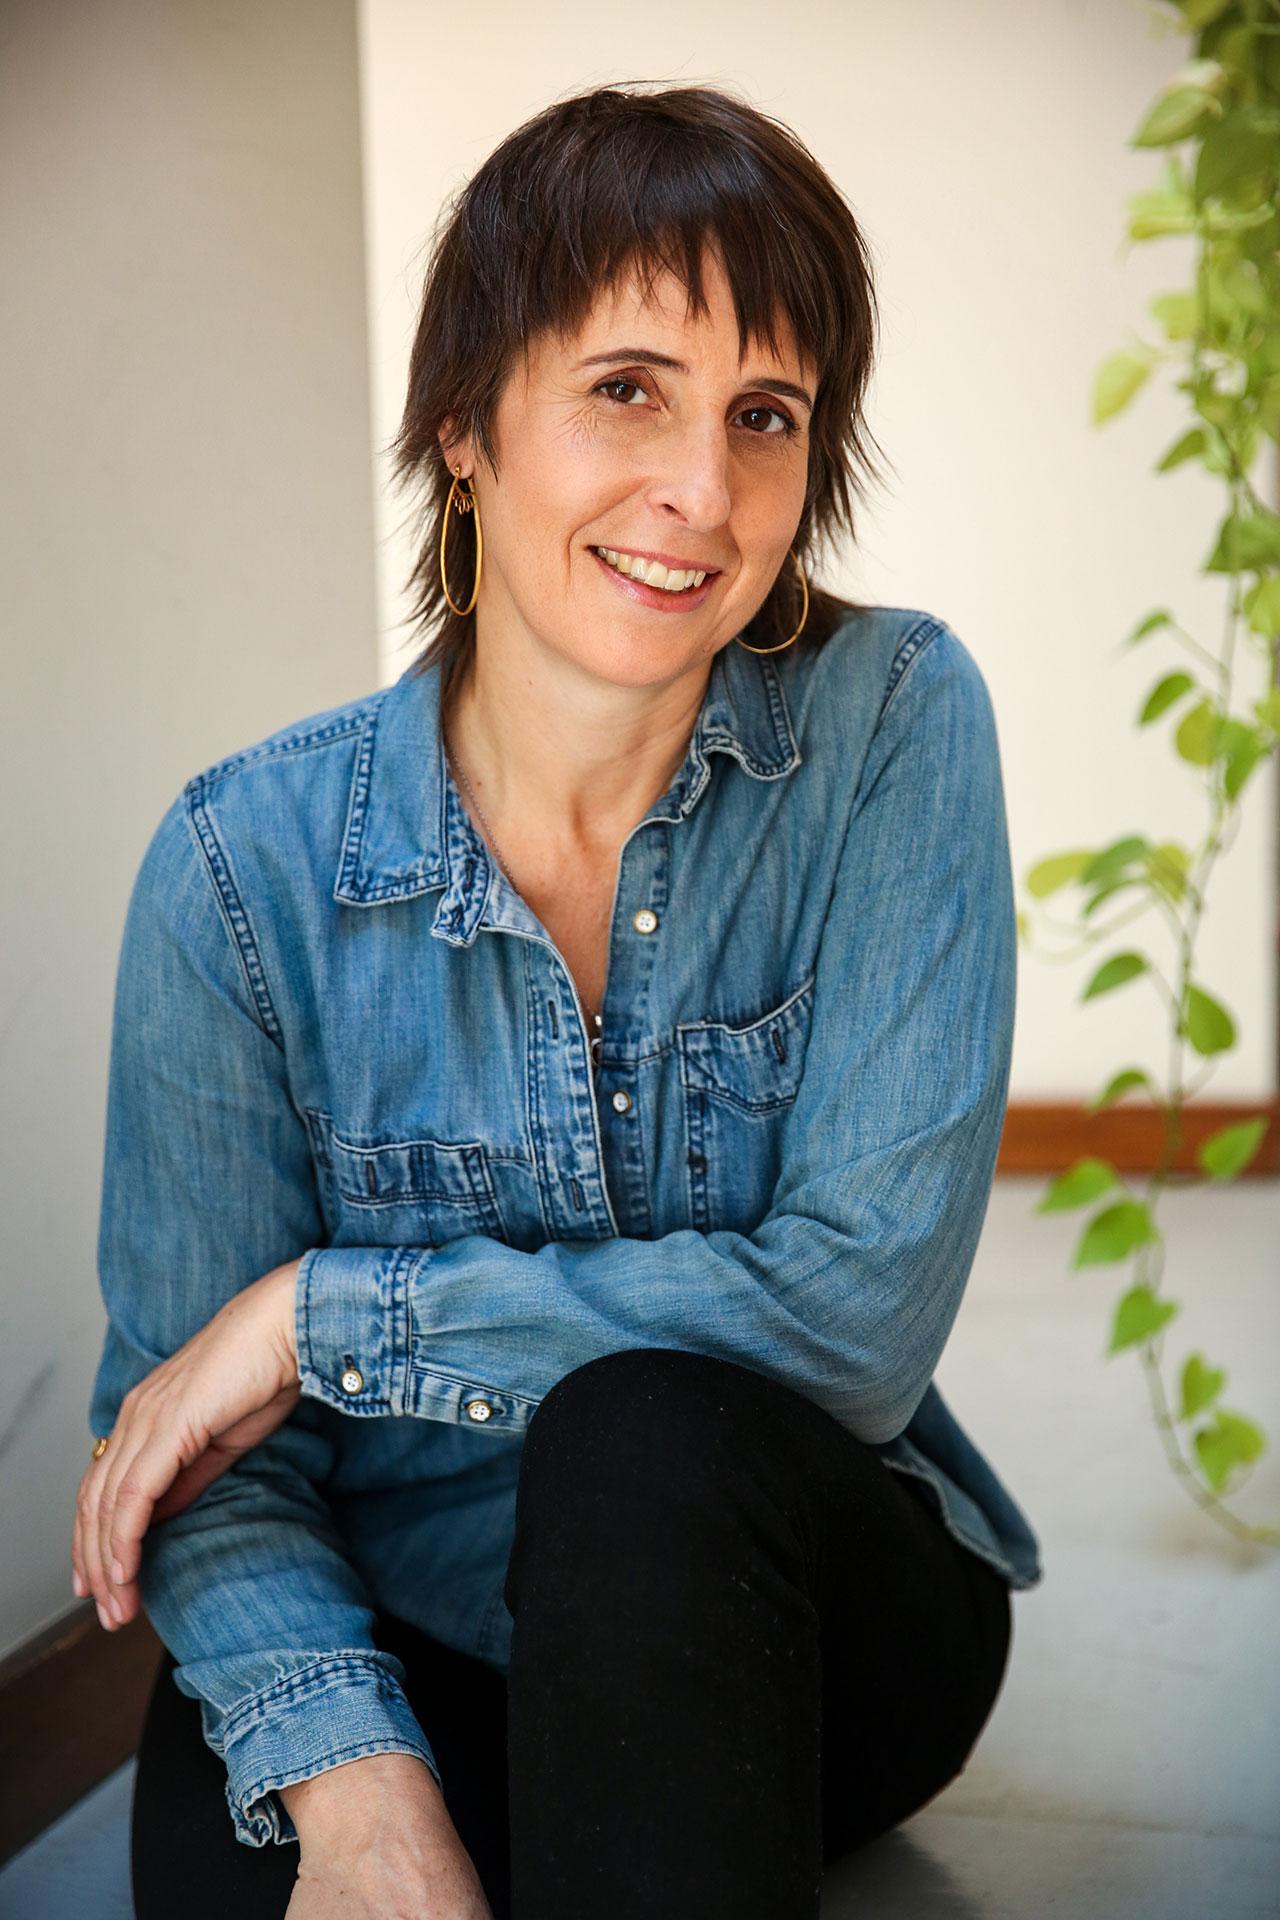 Joelle-Hann-NY-Brooklyn-Book-Doctor-Author-Writing-Coach-Book-Publishing-NYC.jpg